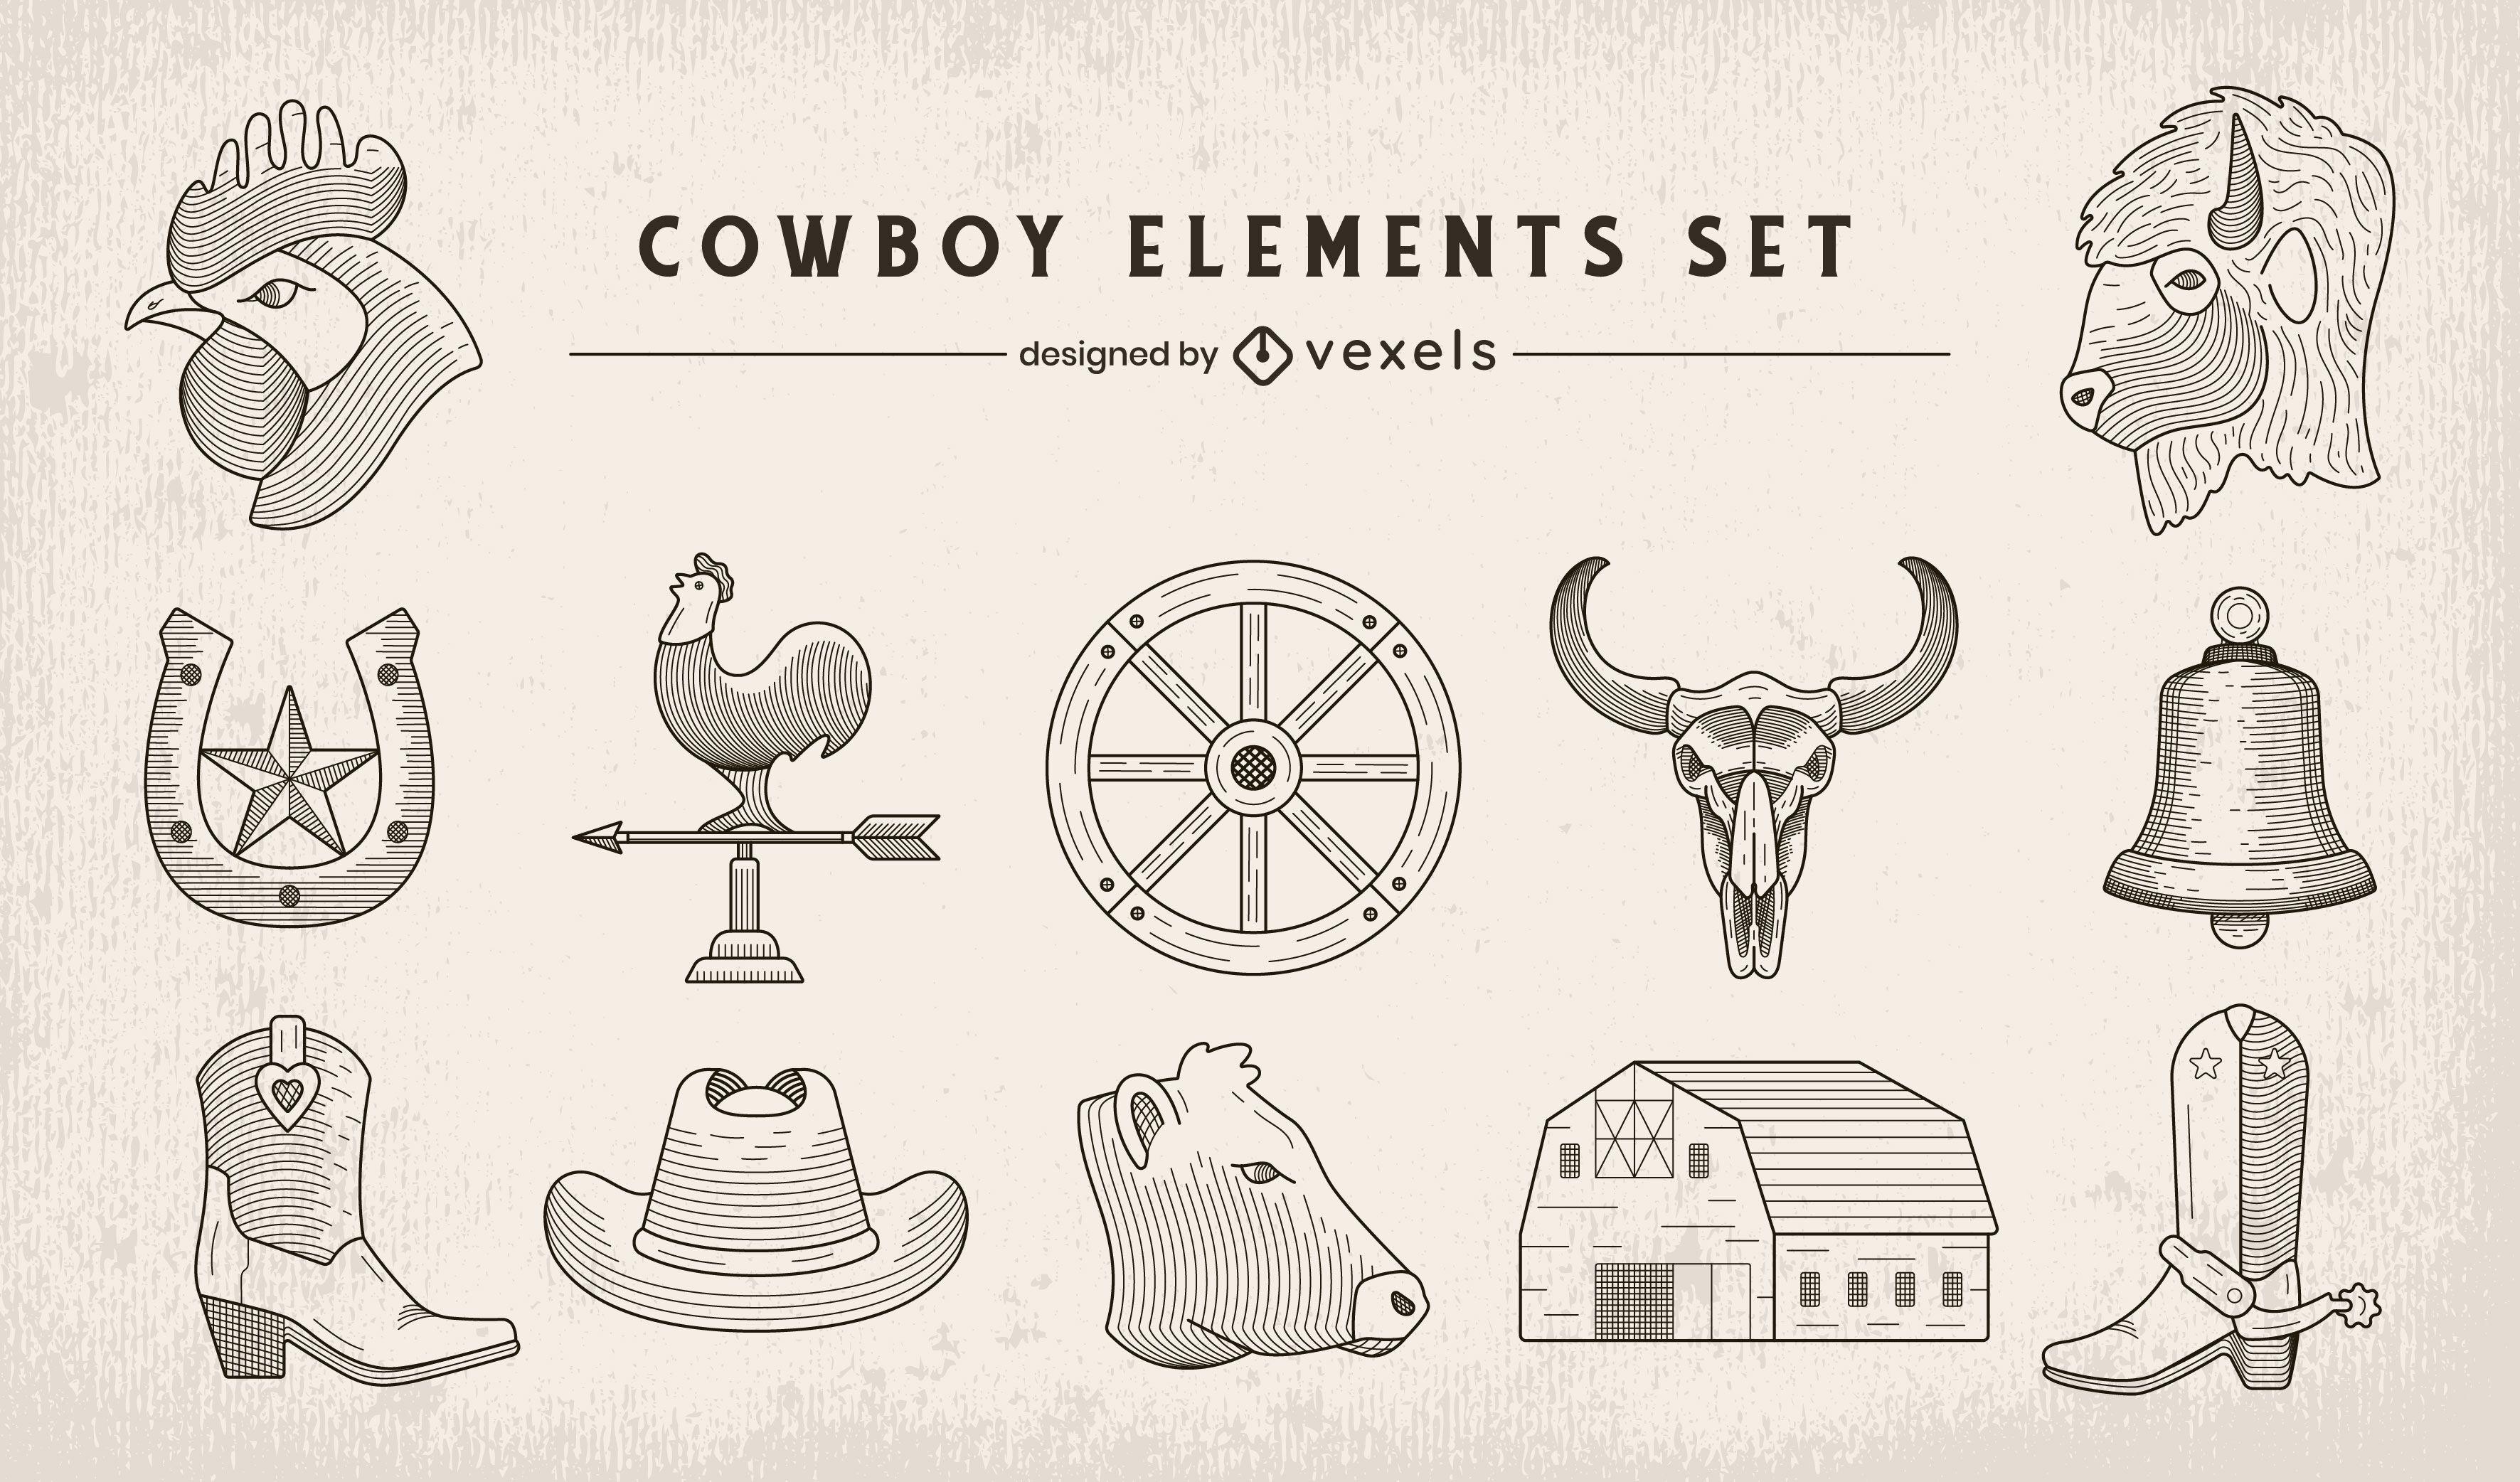 Cowboy-Linien-Kunstelemente-Set